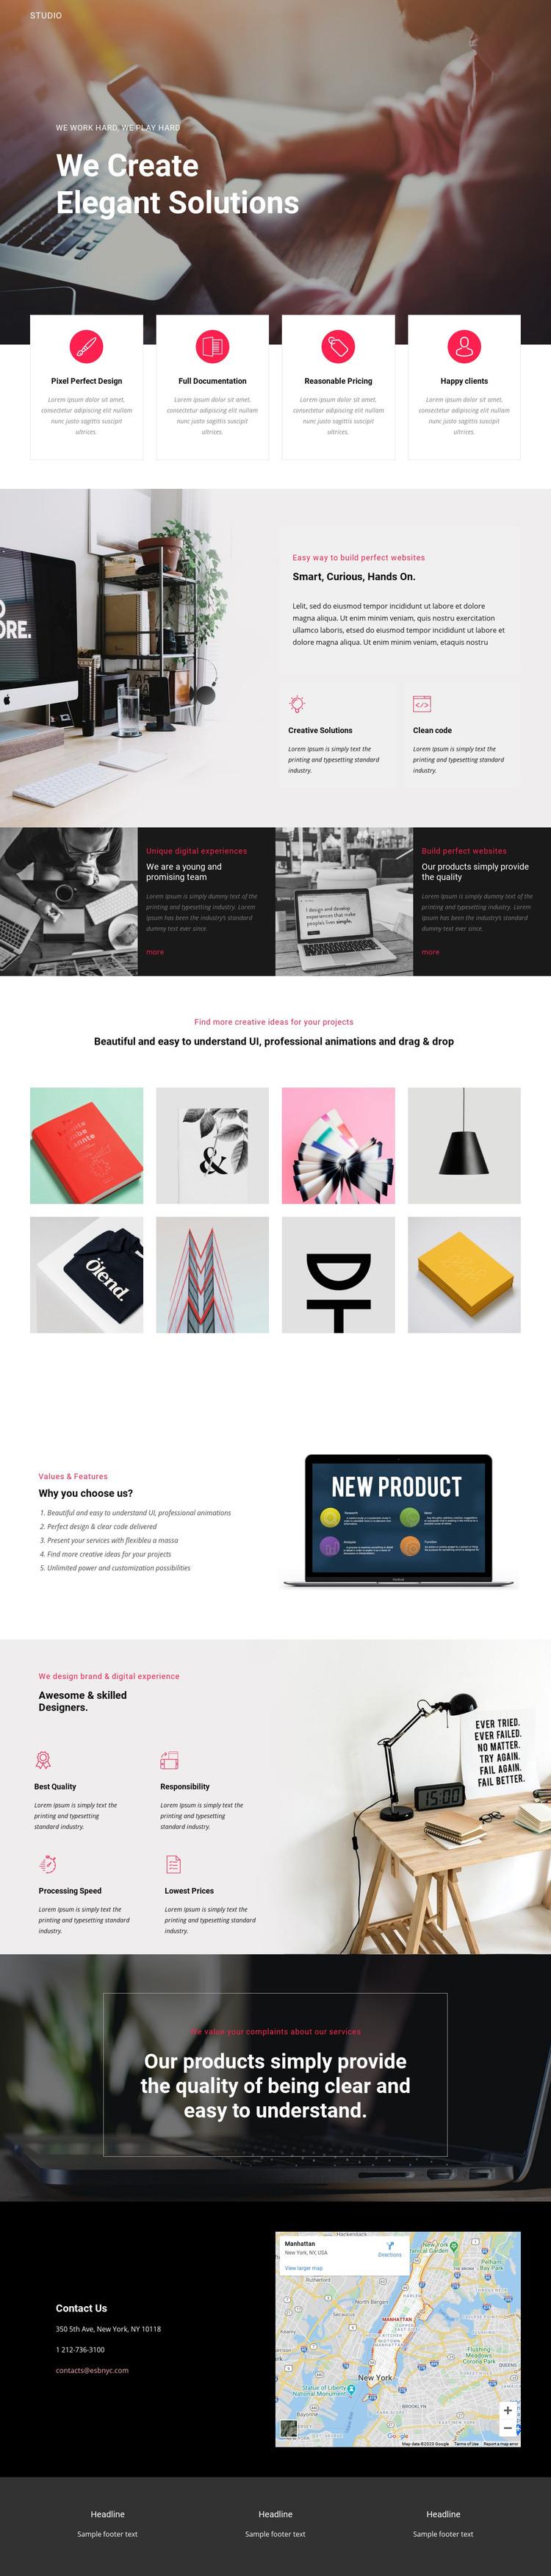 Elegant solutions in business  Homepage Design